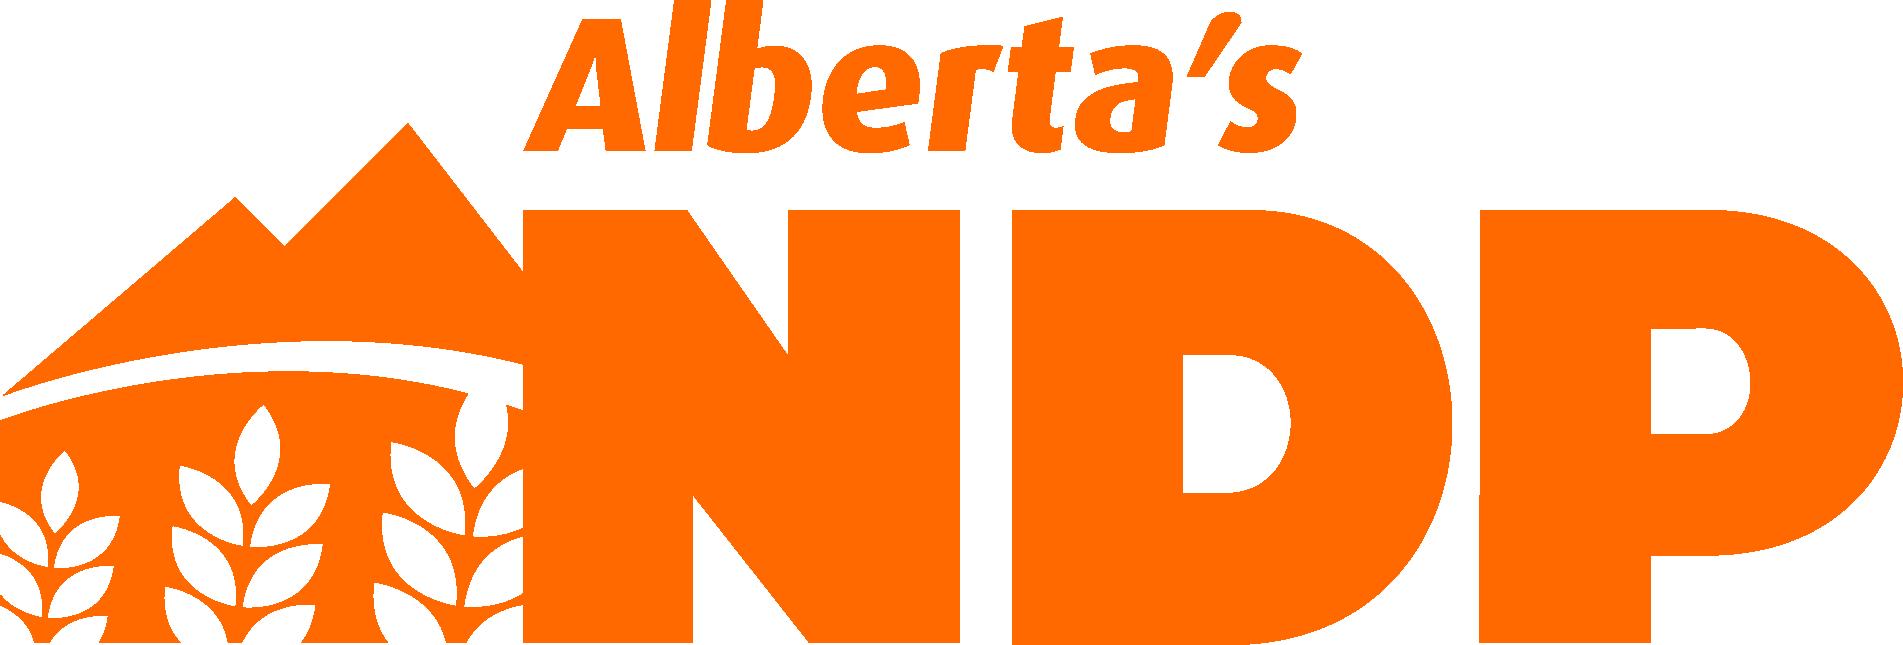 Image result for alberta NDP logo